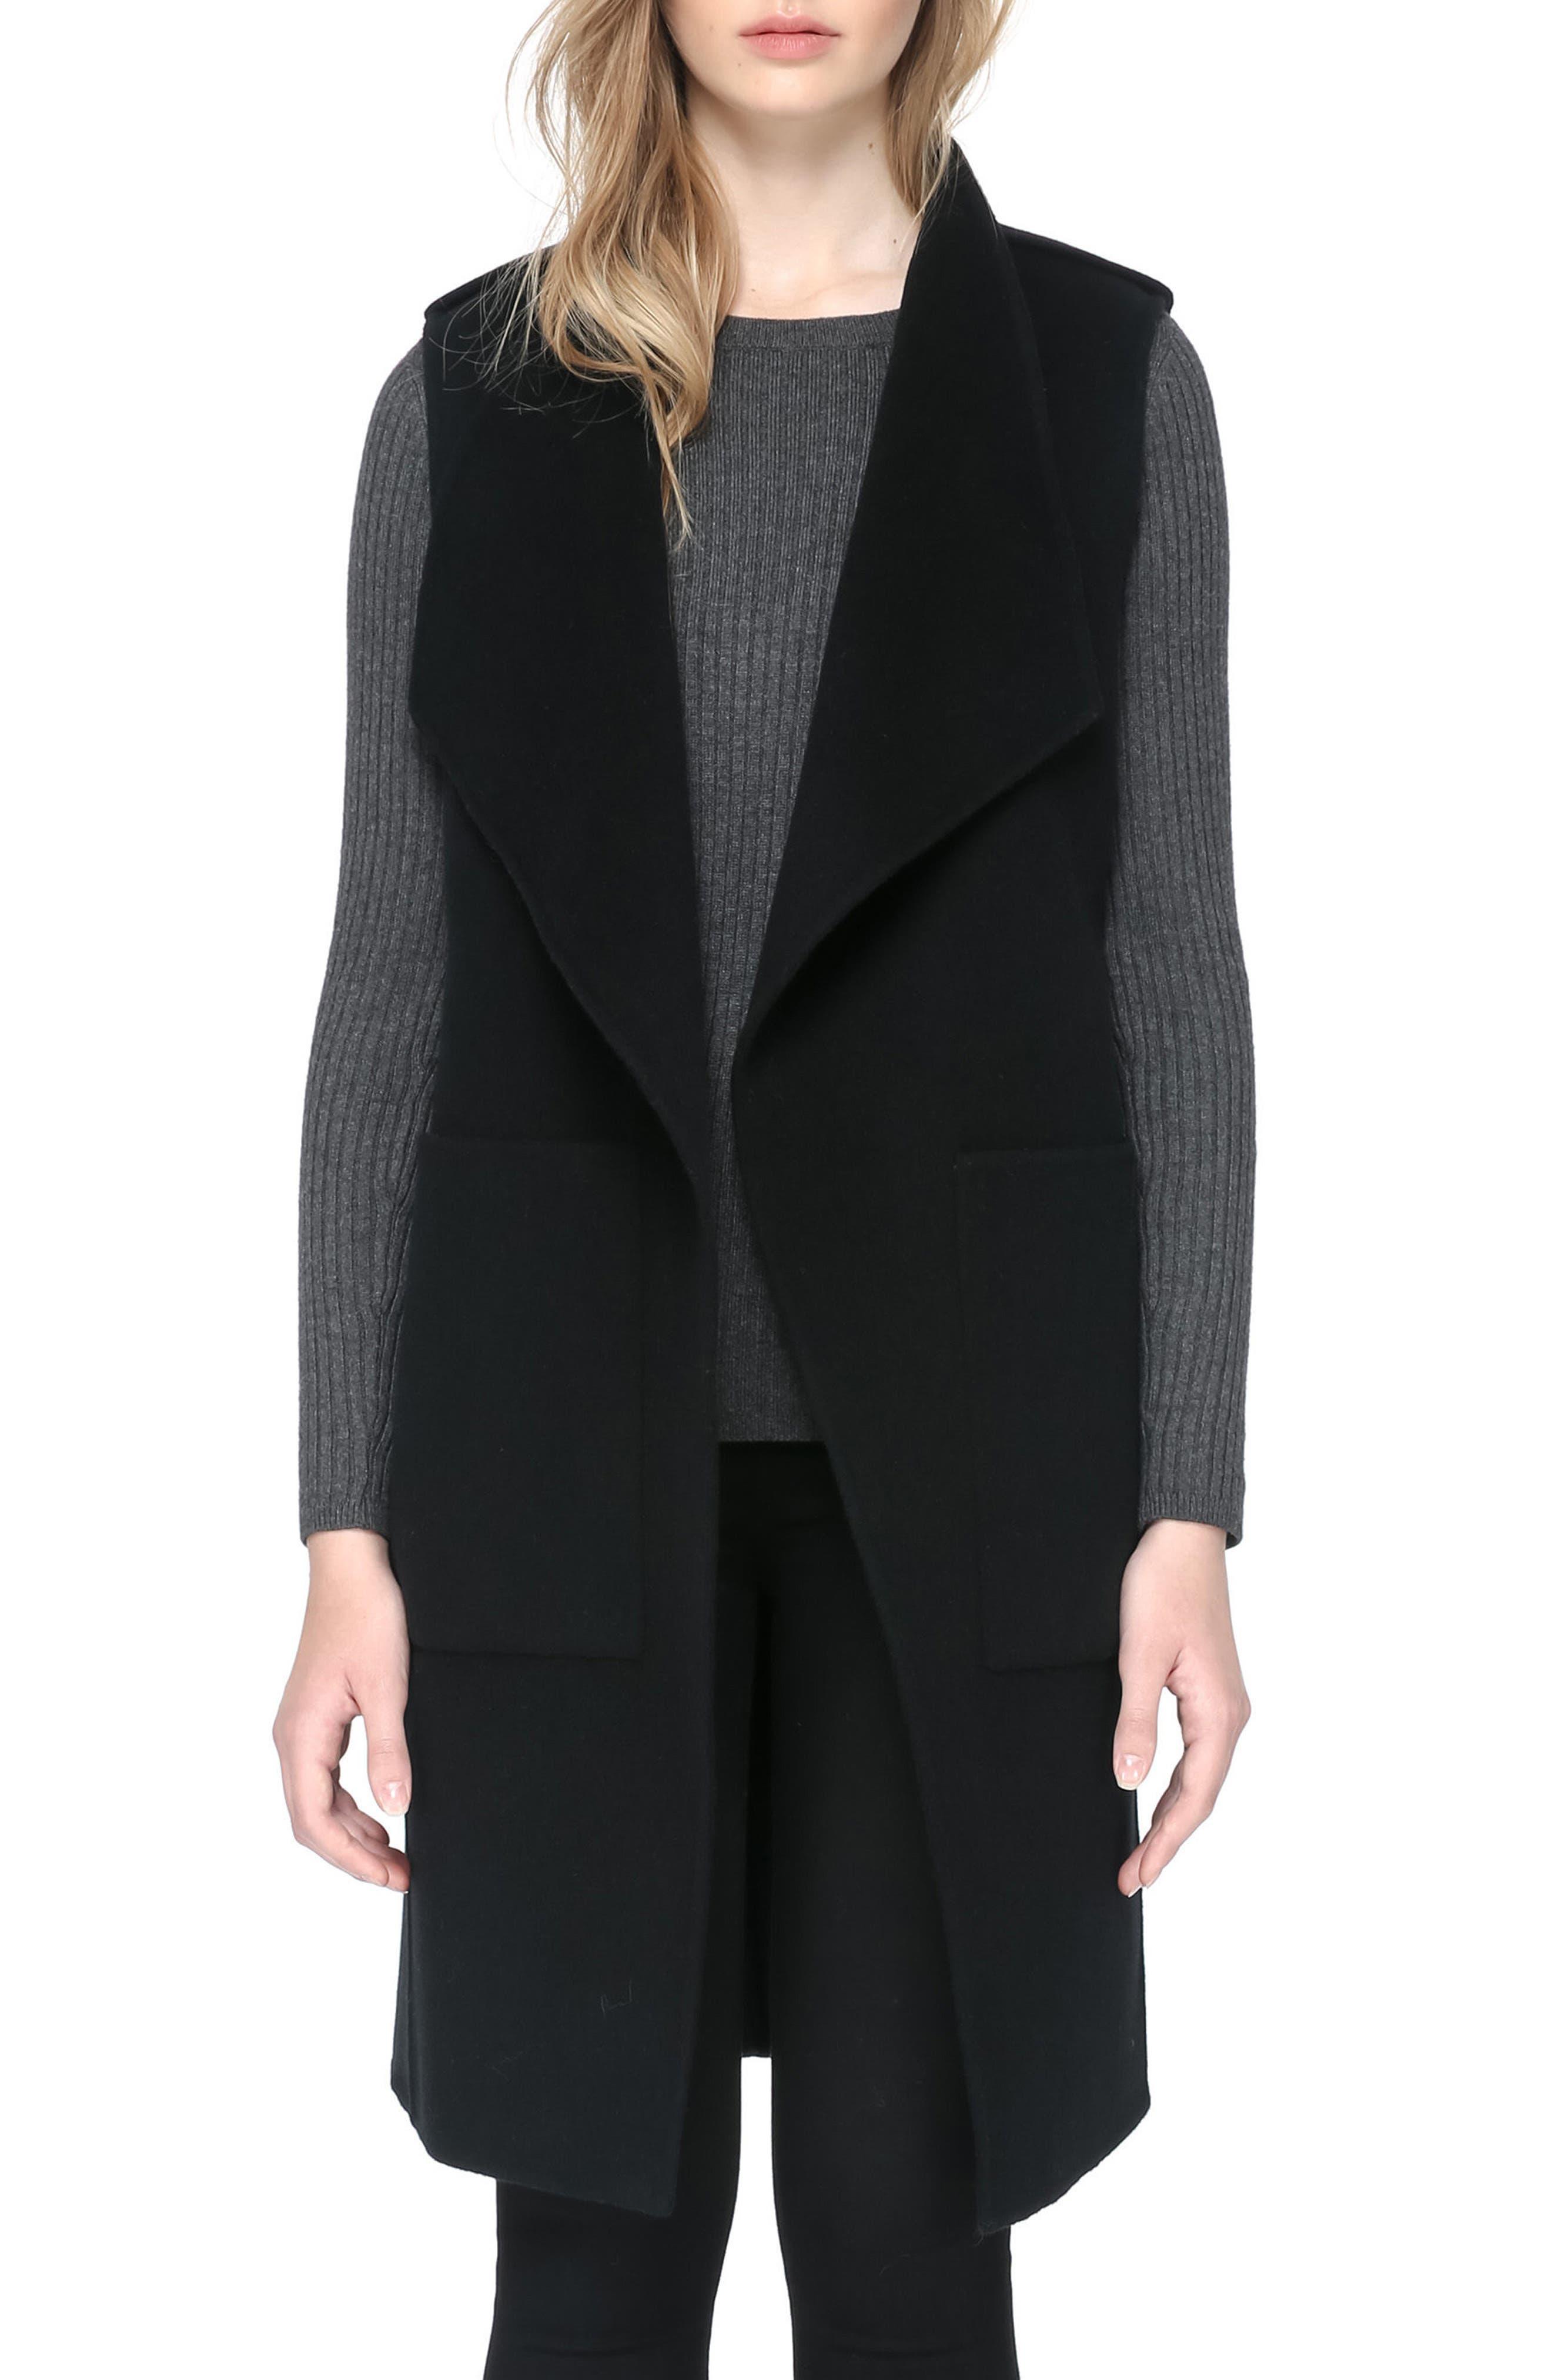 SOIA & KYO, Reversible Wool Blend Vest, Main thumbnail 1, color, 001